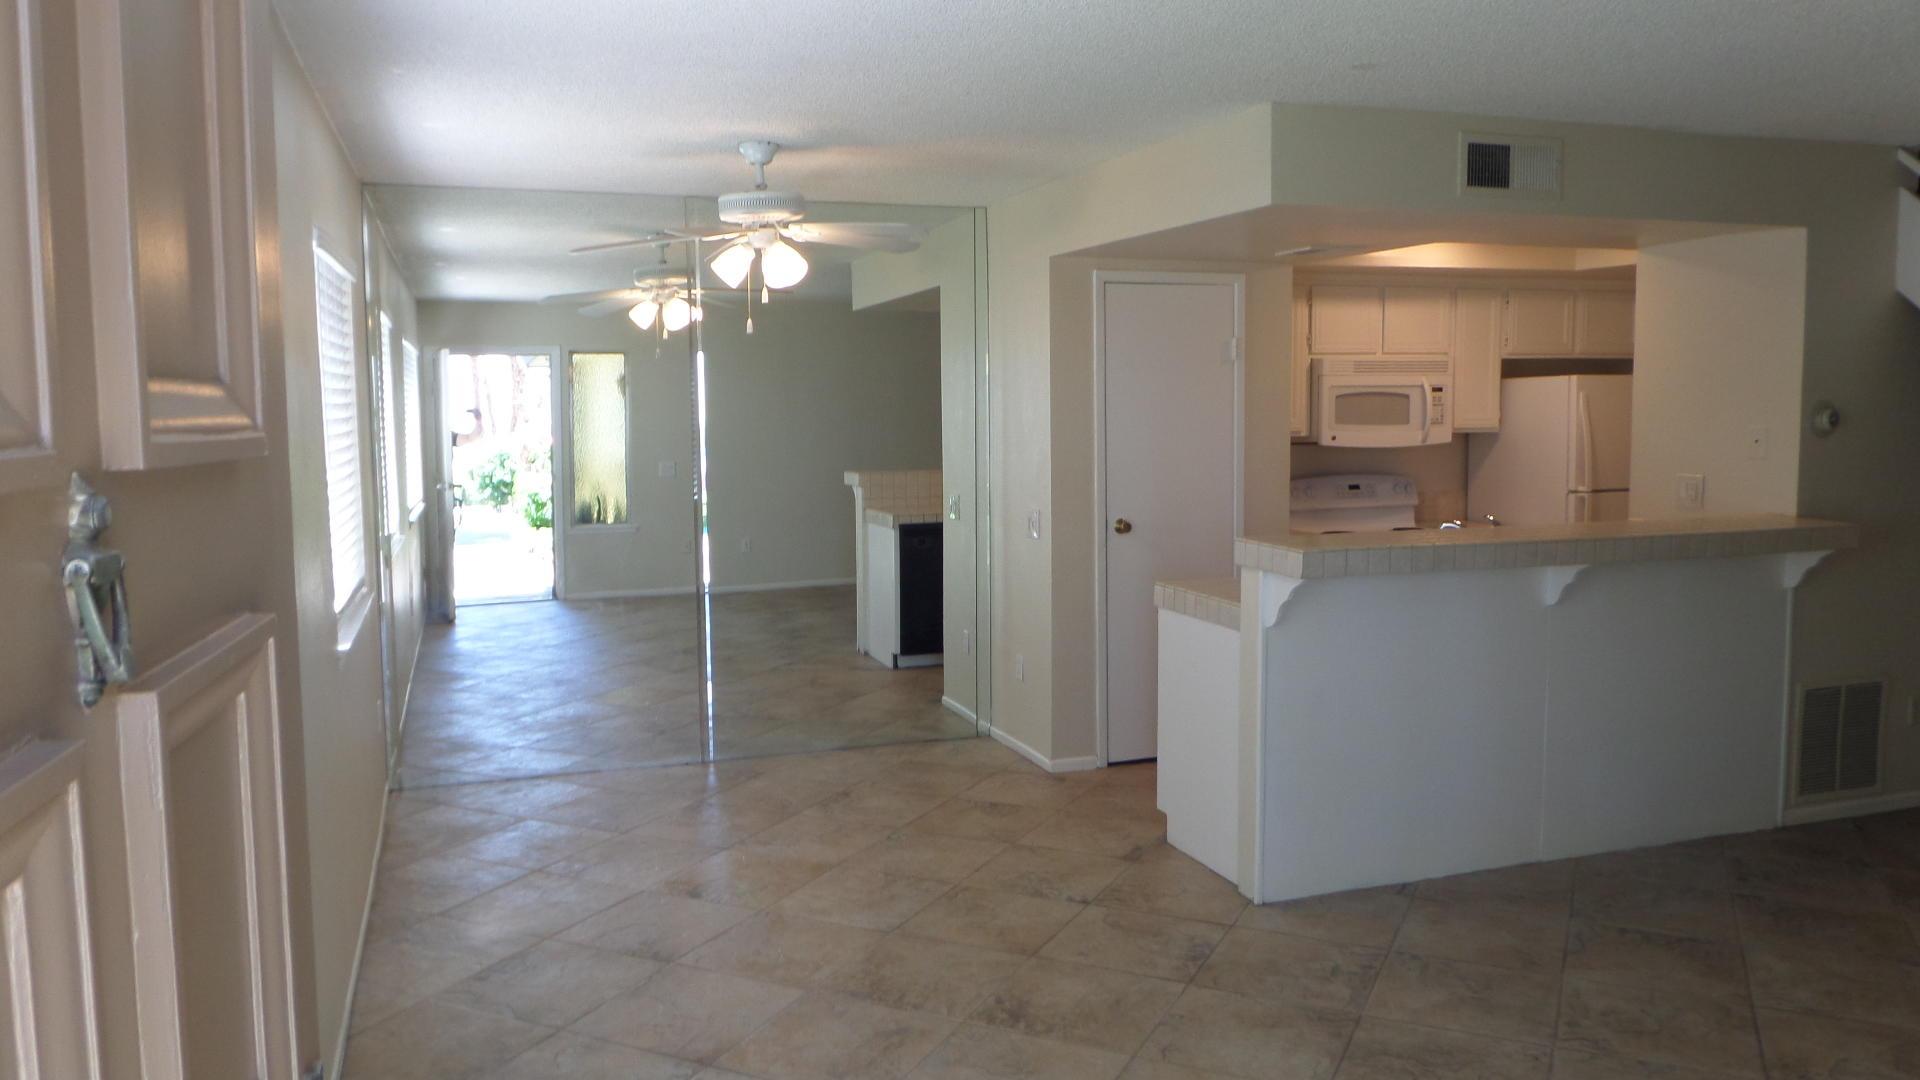 72669 Eagle Road, Palm Desert, California 92260, 2 Bedrooms Bedrooms, ,1 BathroomBathrooms,Condominium,For Sale,72669 Eagle Road,2,219061631